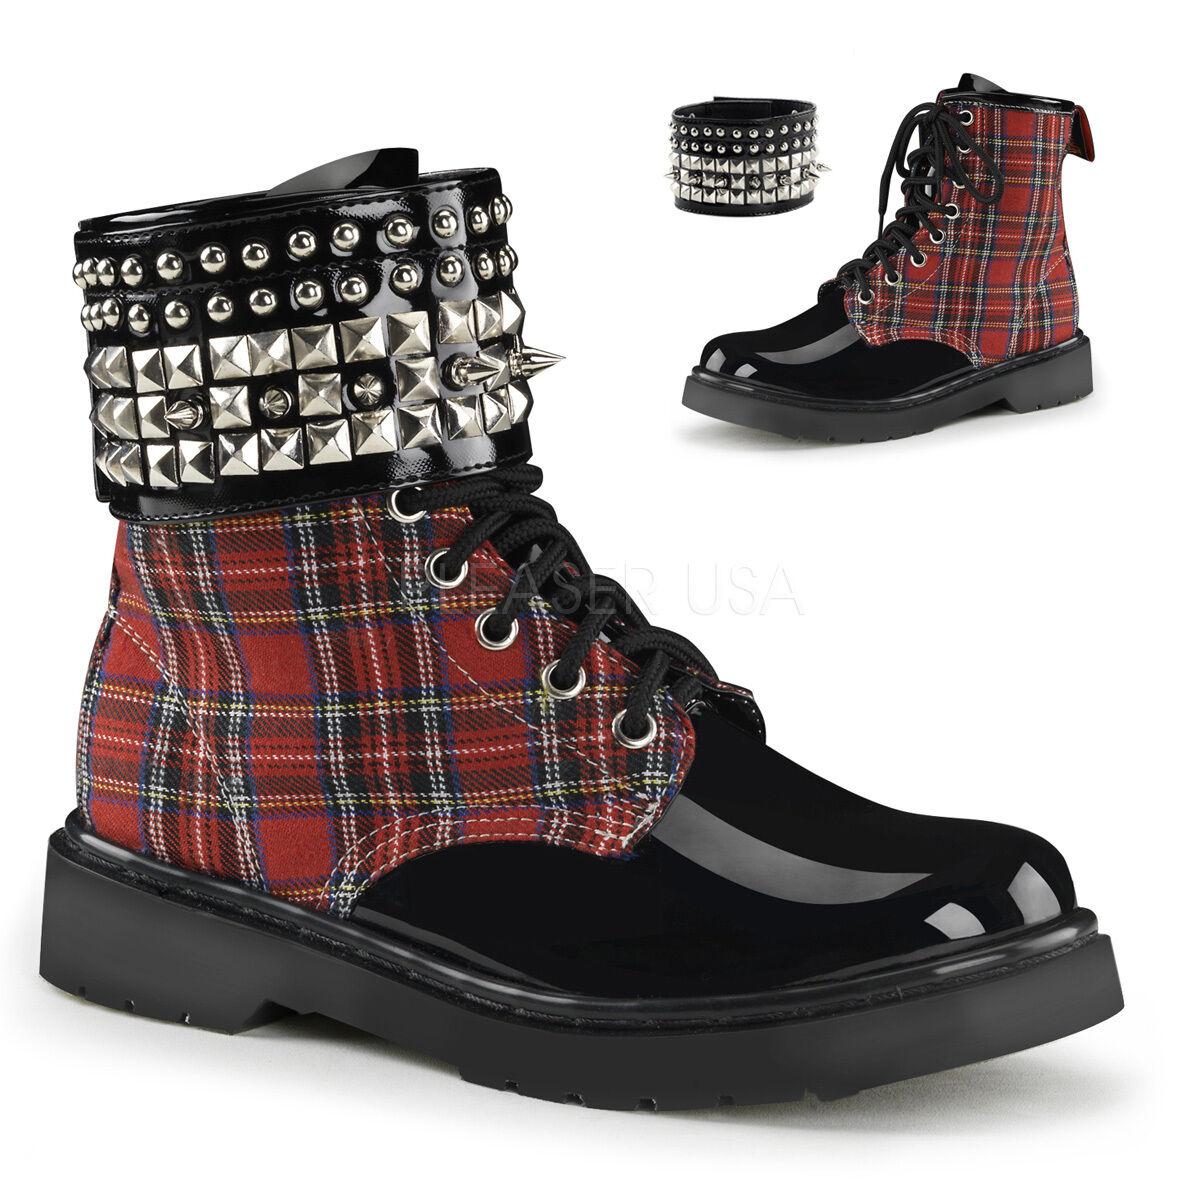 Demonia Plaid Vegan Spiked Studded Ankle Combat Boots Rocker Punk Women's 6-12